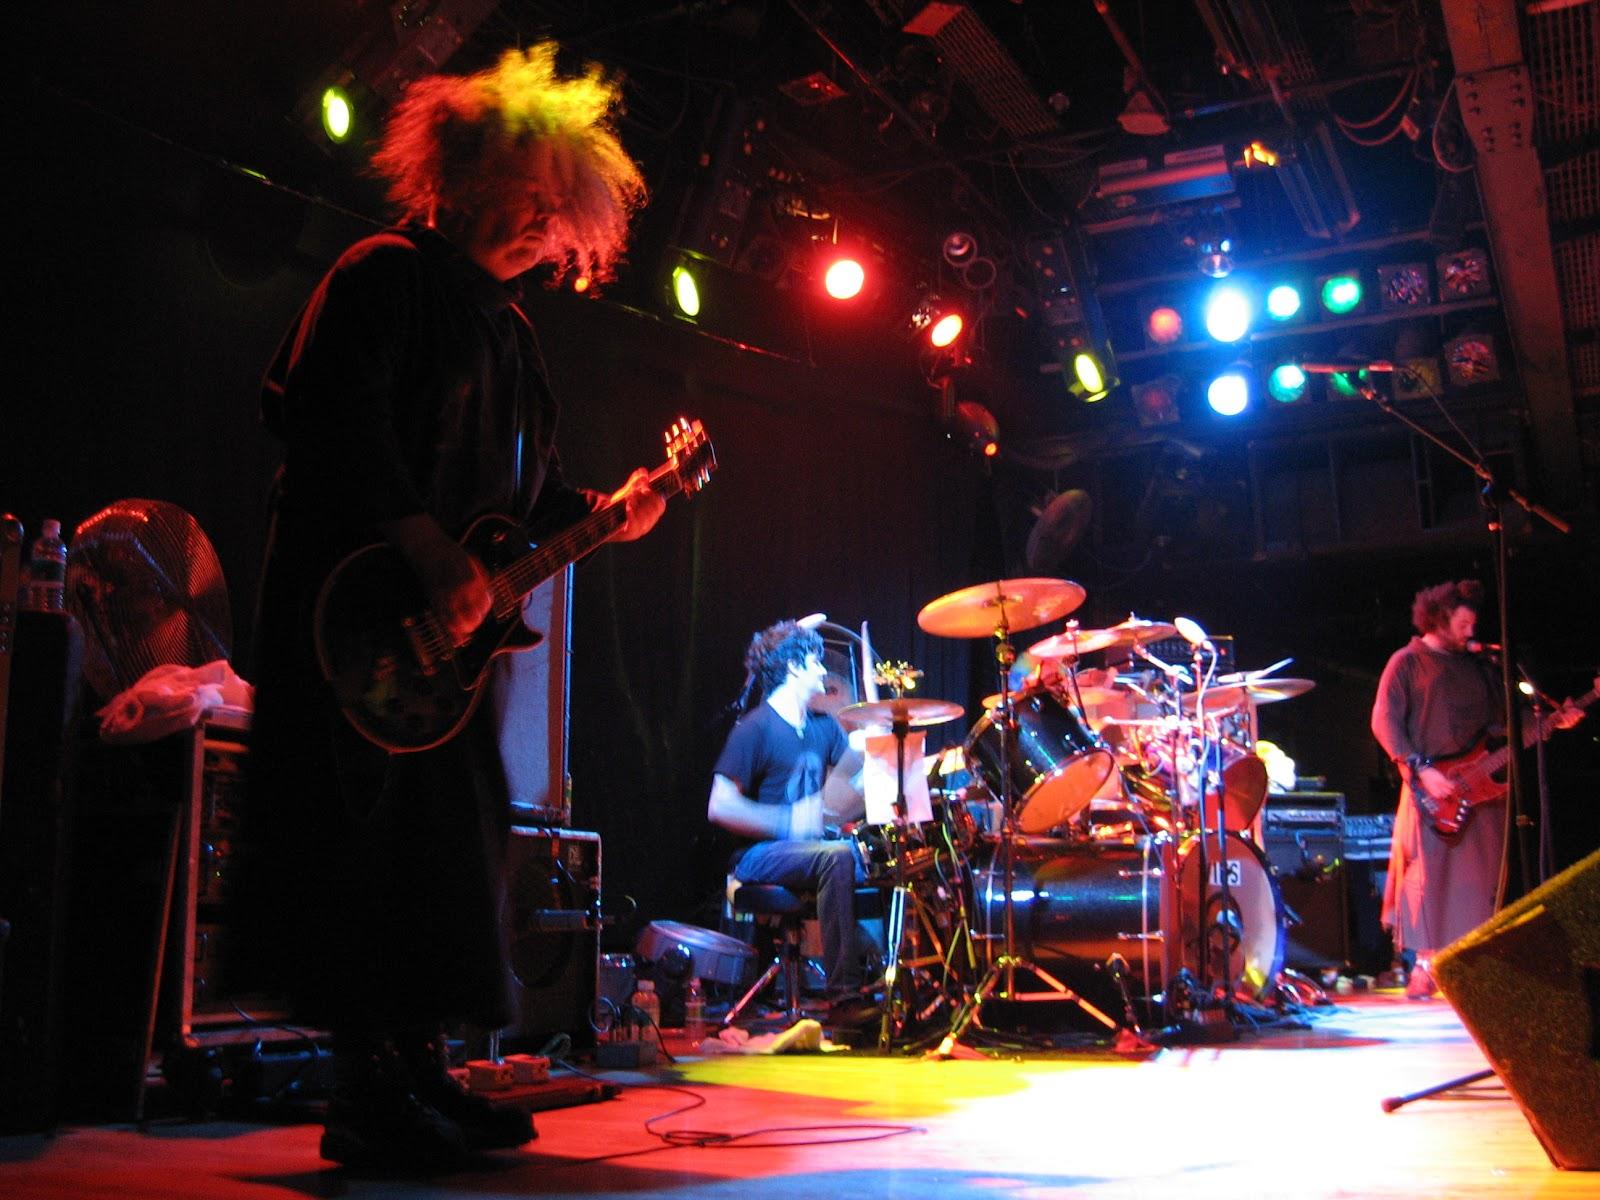 Melvins ปล่อยซิงเกิ้ลใหม่ The Great Good Place จากอัลบั้มใหม่ Working With God 4